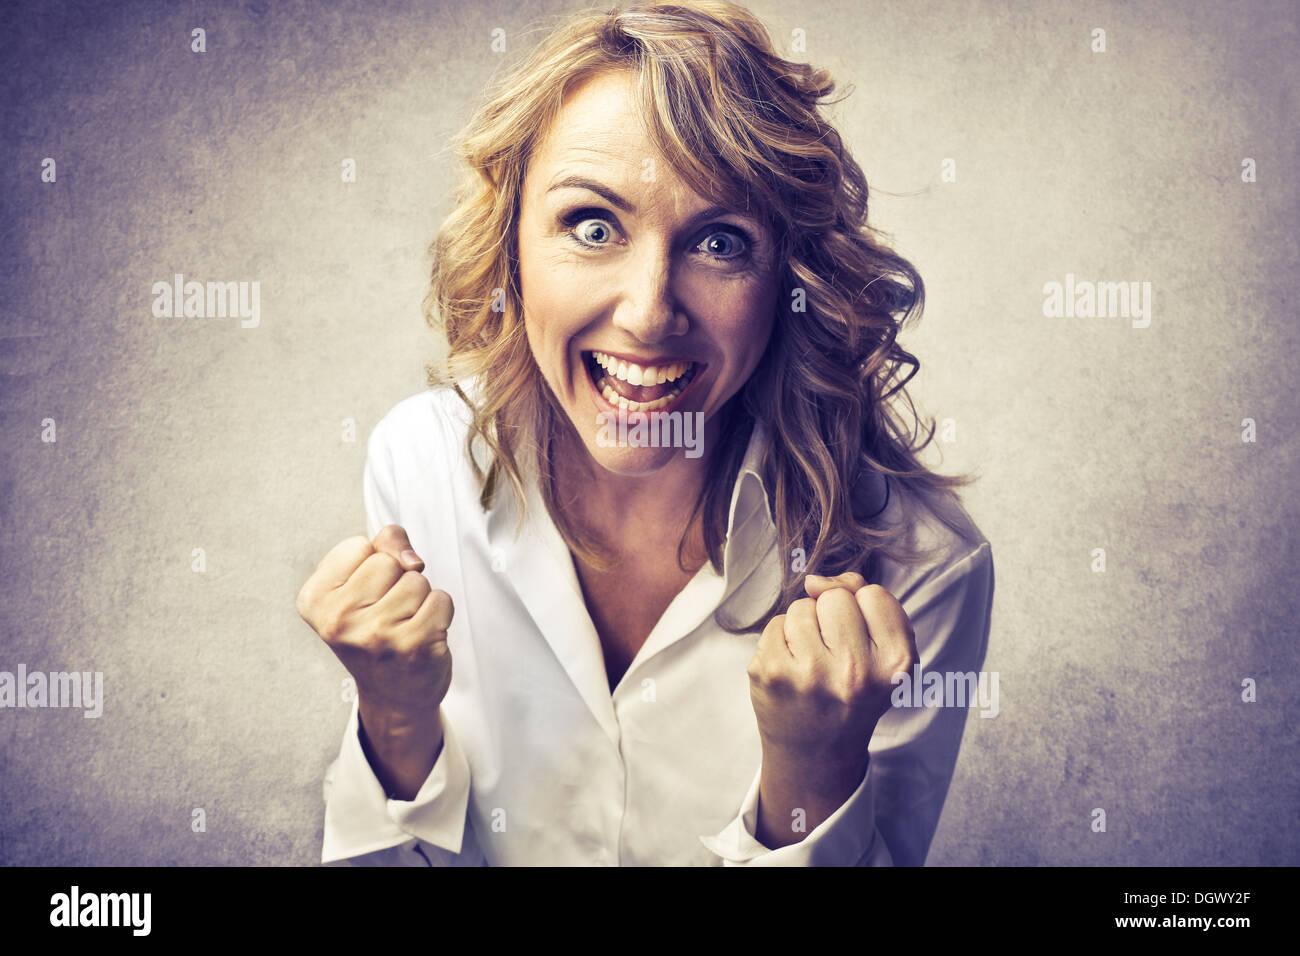 Mujer rubia regocijo Imagen De Stock